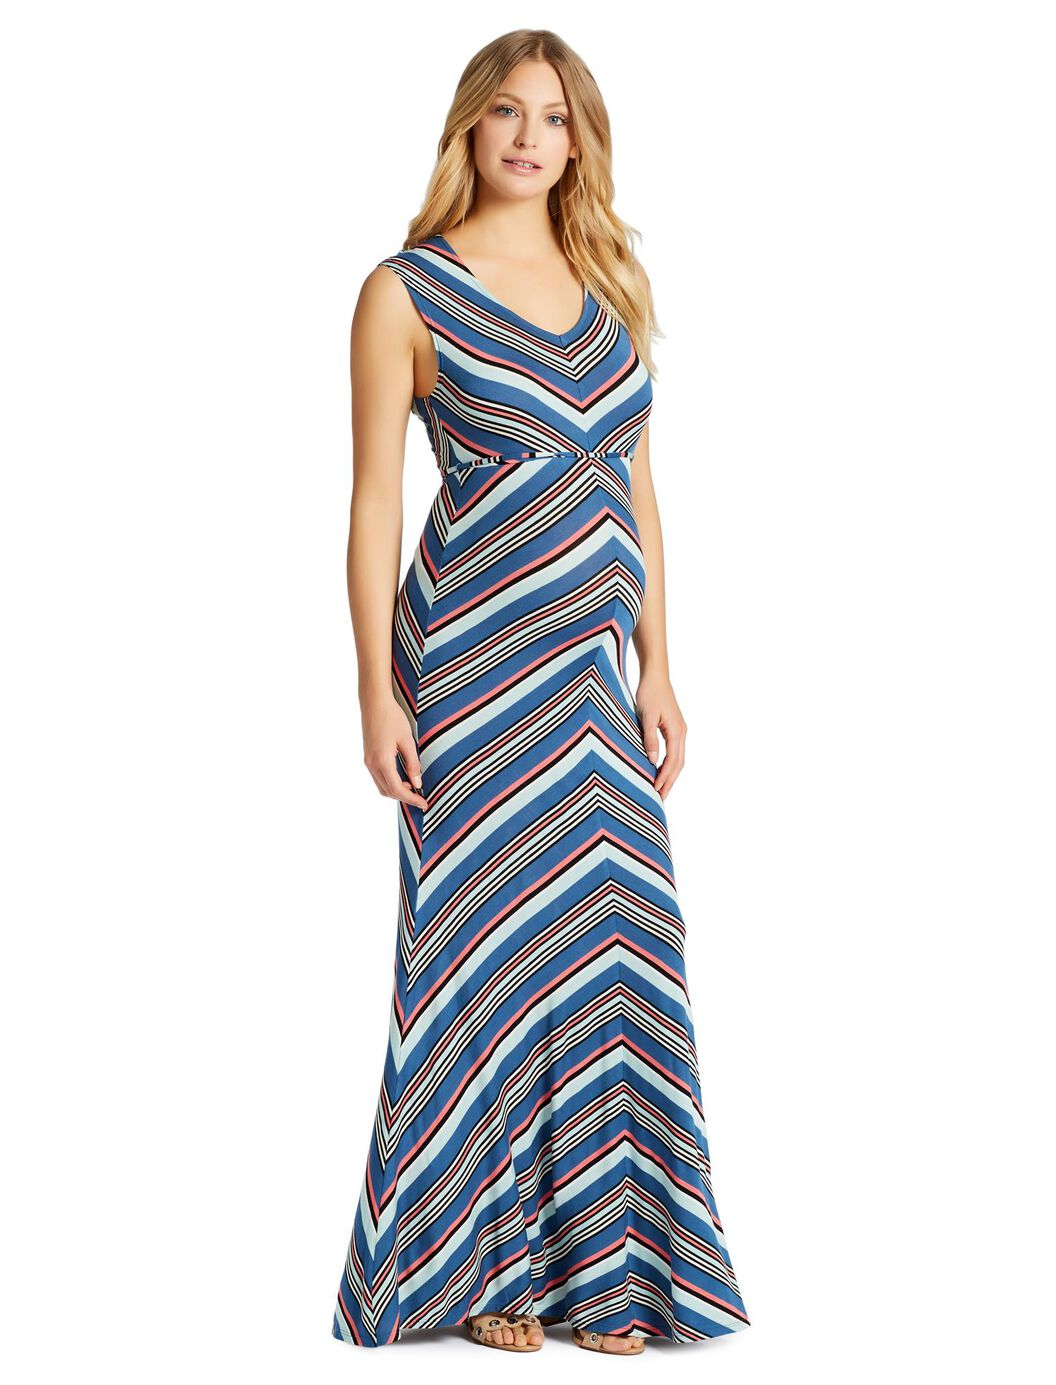 Jessica simpson striped maternity maxi dress motherhood maternity jessica simpson striped maternity maxi dress blue stripe ombrellifo Choice Image